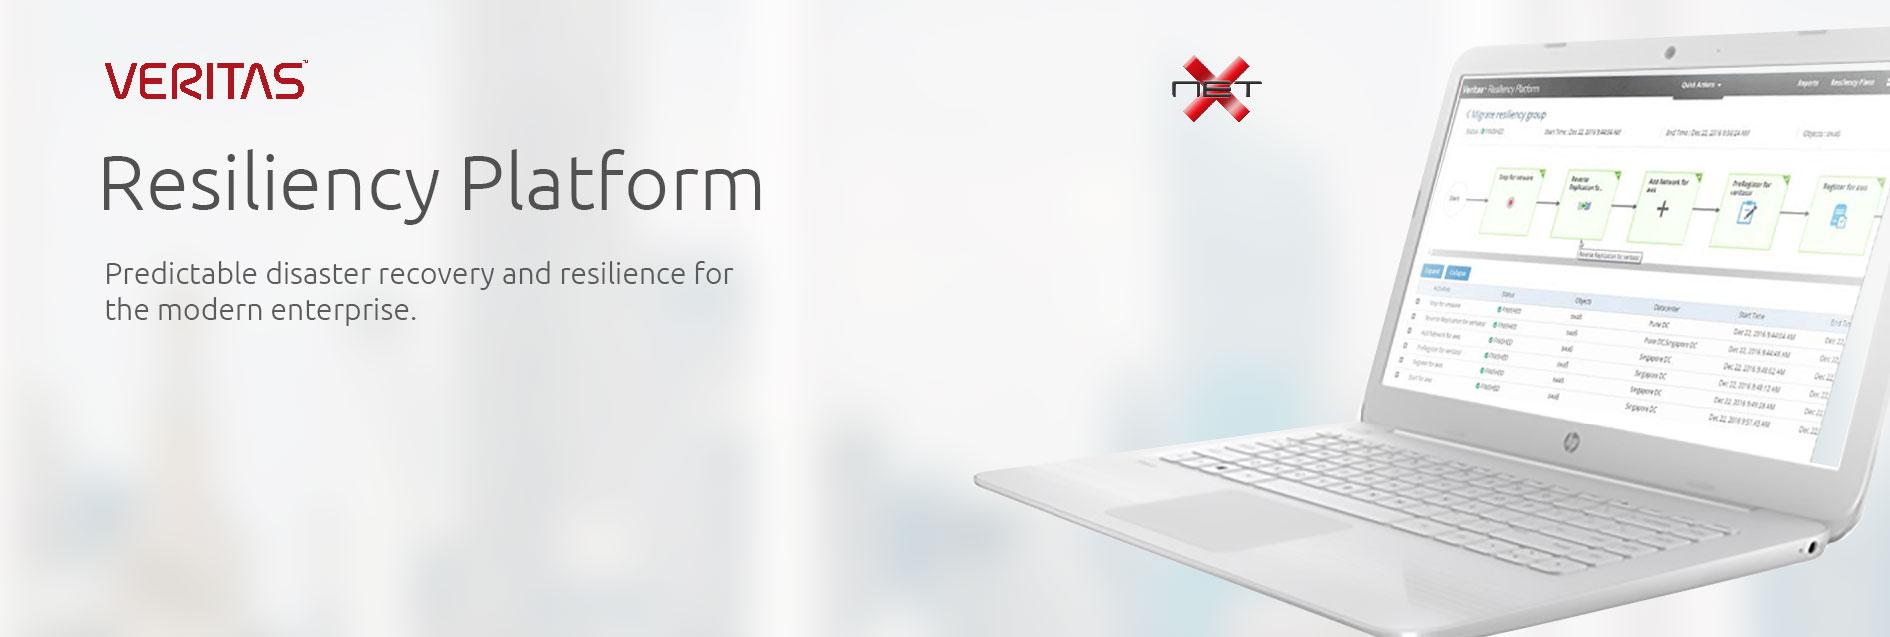 veritas resiliency platform with netx